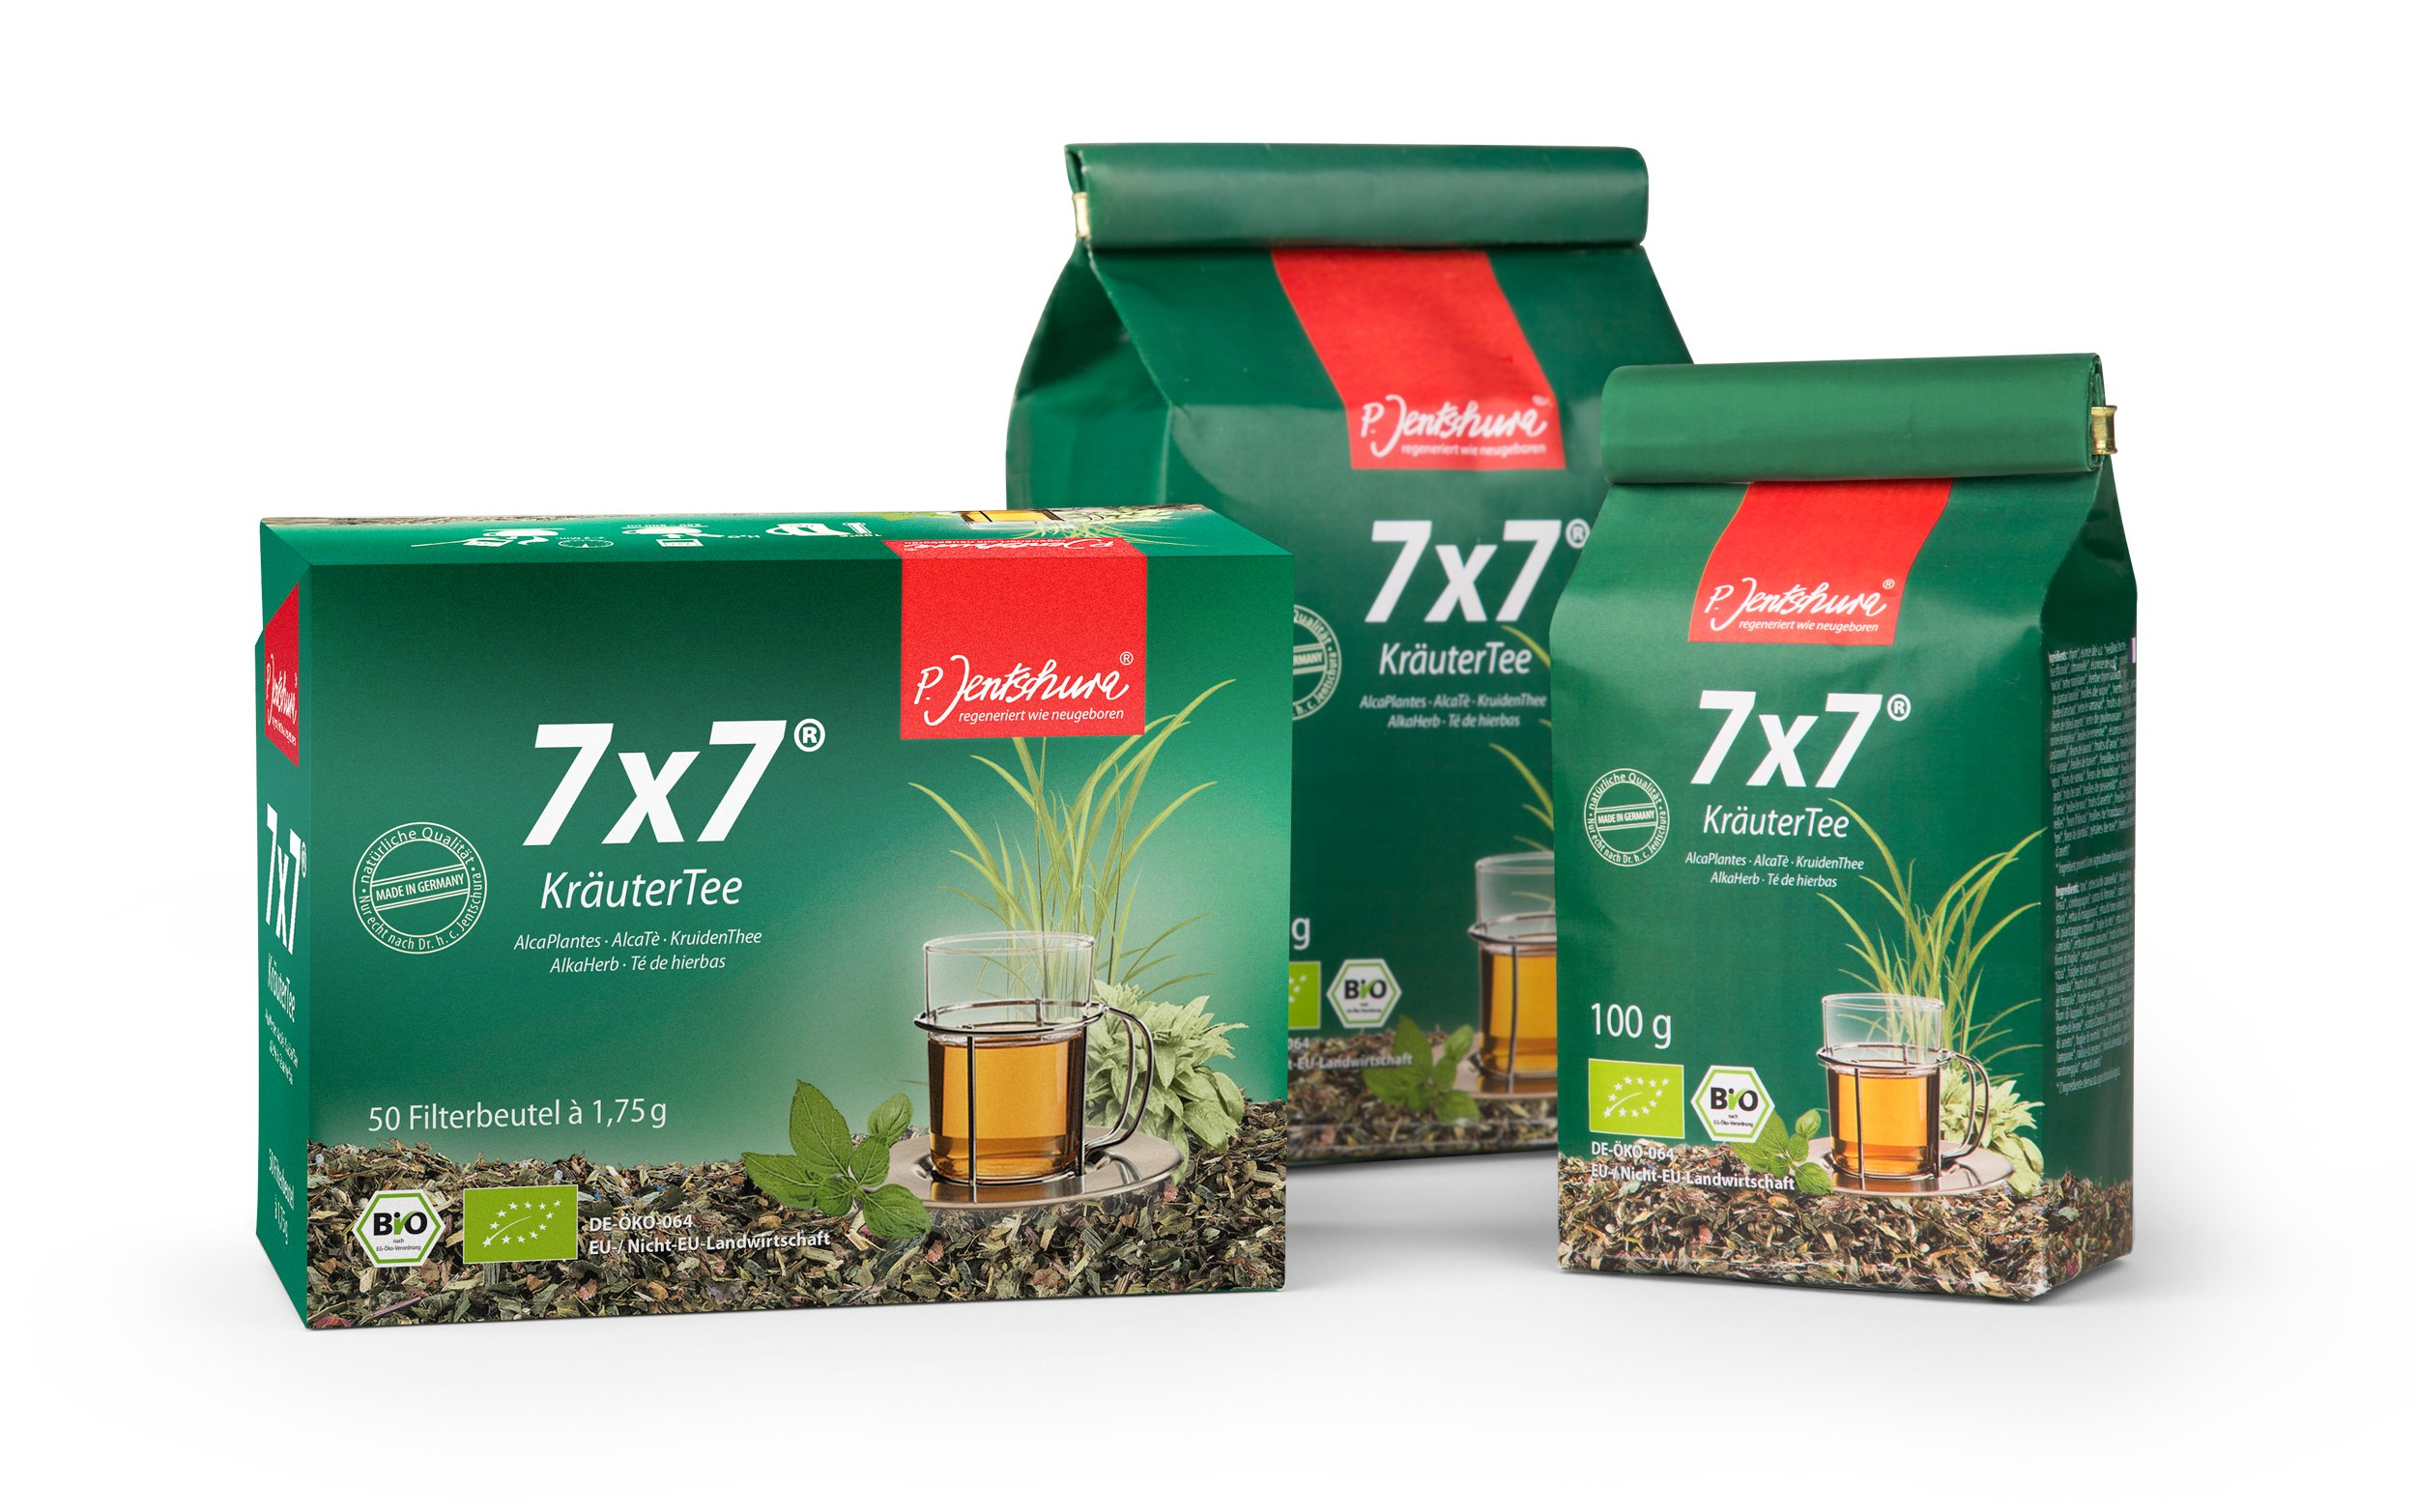 Jetzt-NEU-Jentschura-7×7-KruterTee-500-g-in-Bio-Qualitt-2-x-WurzelKraft-fruchtigwrzig–10-g-gratis